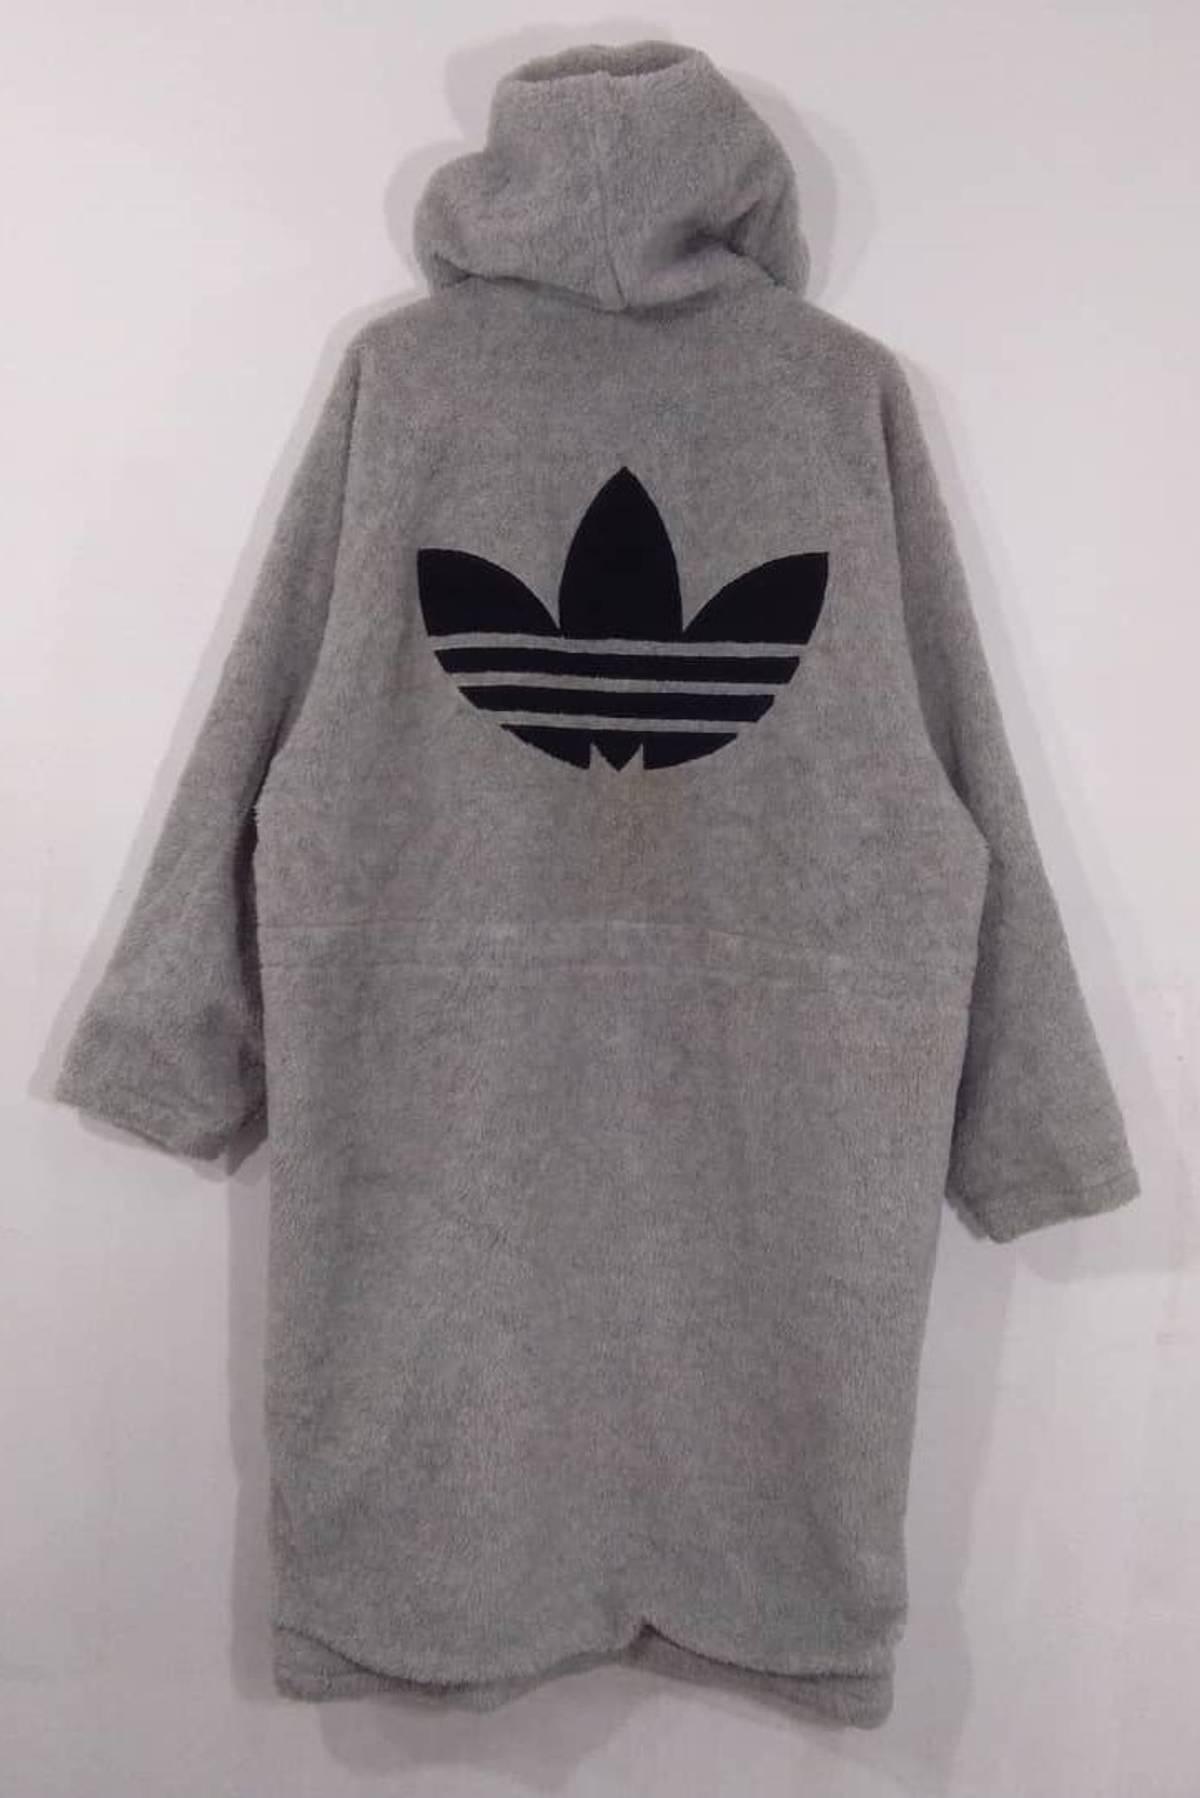 Adidas. Adidas Long Fleece Jacket Big Logo Hoodie. Not Nike Puma Kappa Tommy  Hilfiger ... 6424271eb8